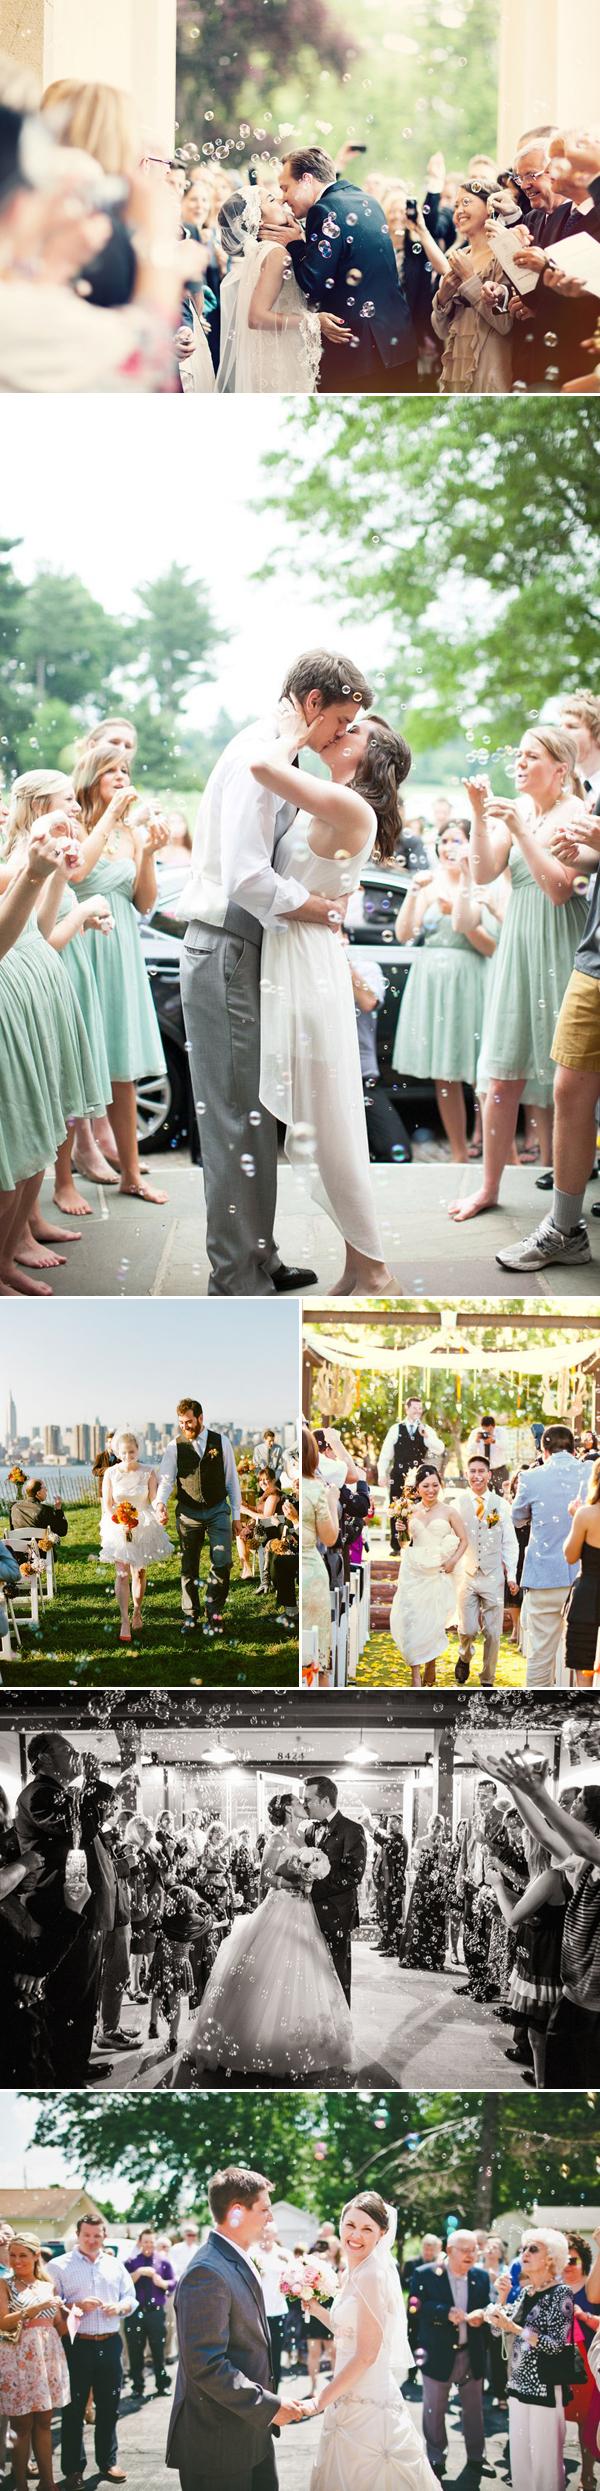 wedding-exit01-bubble